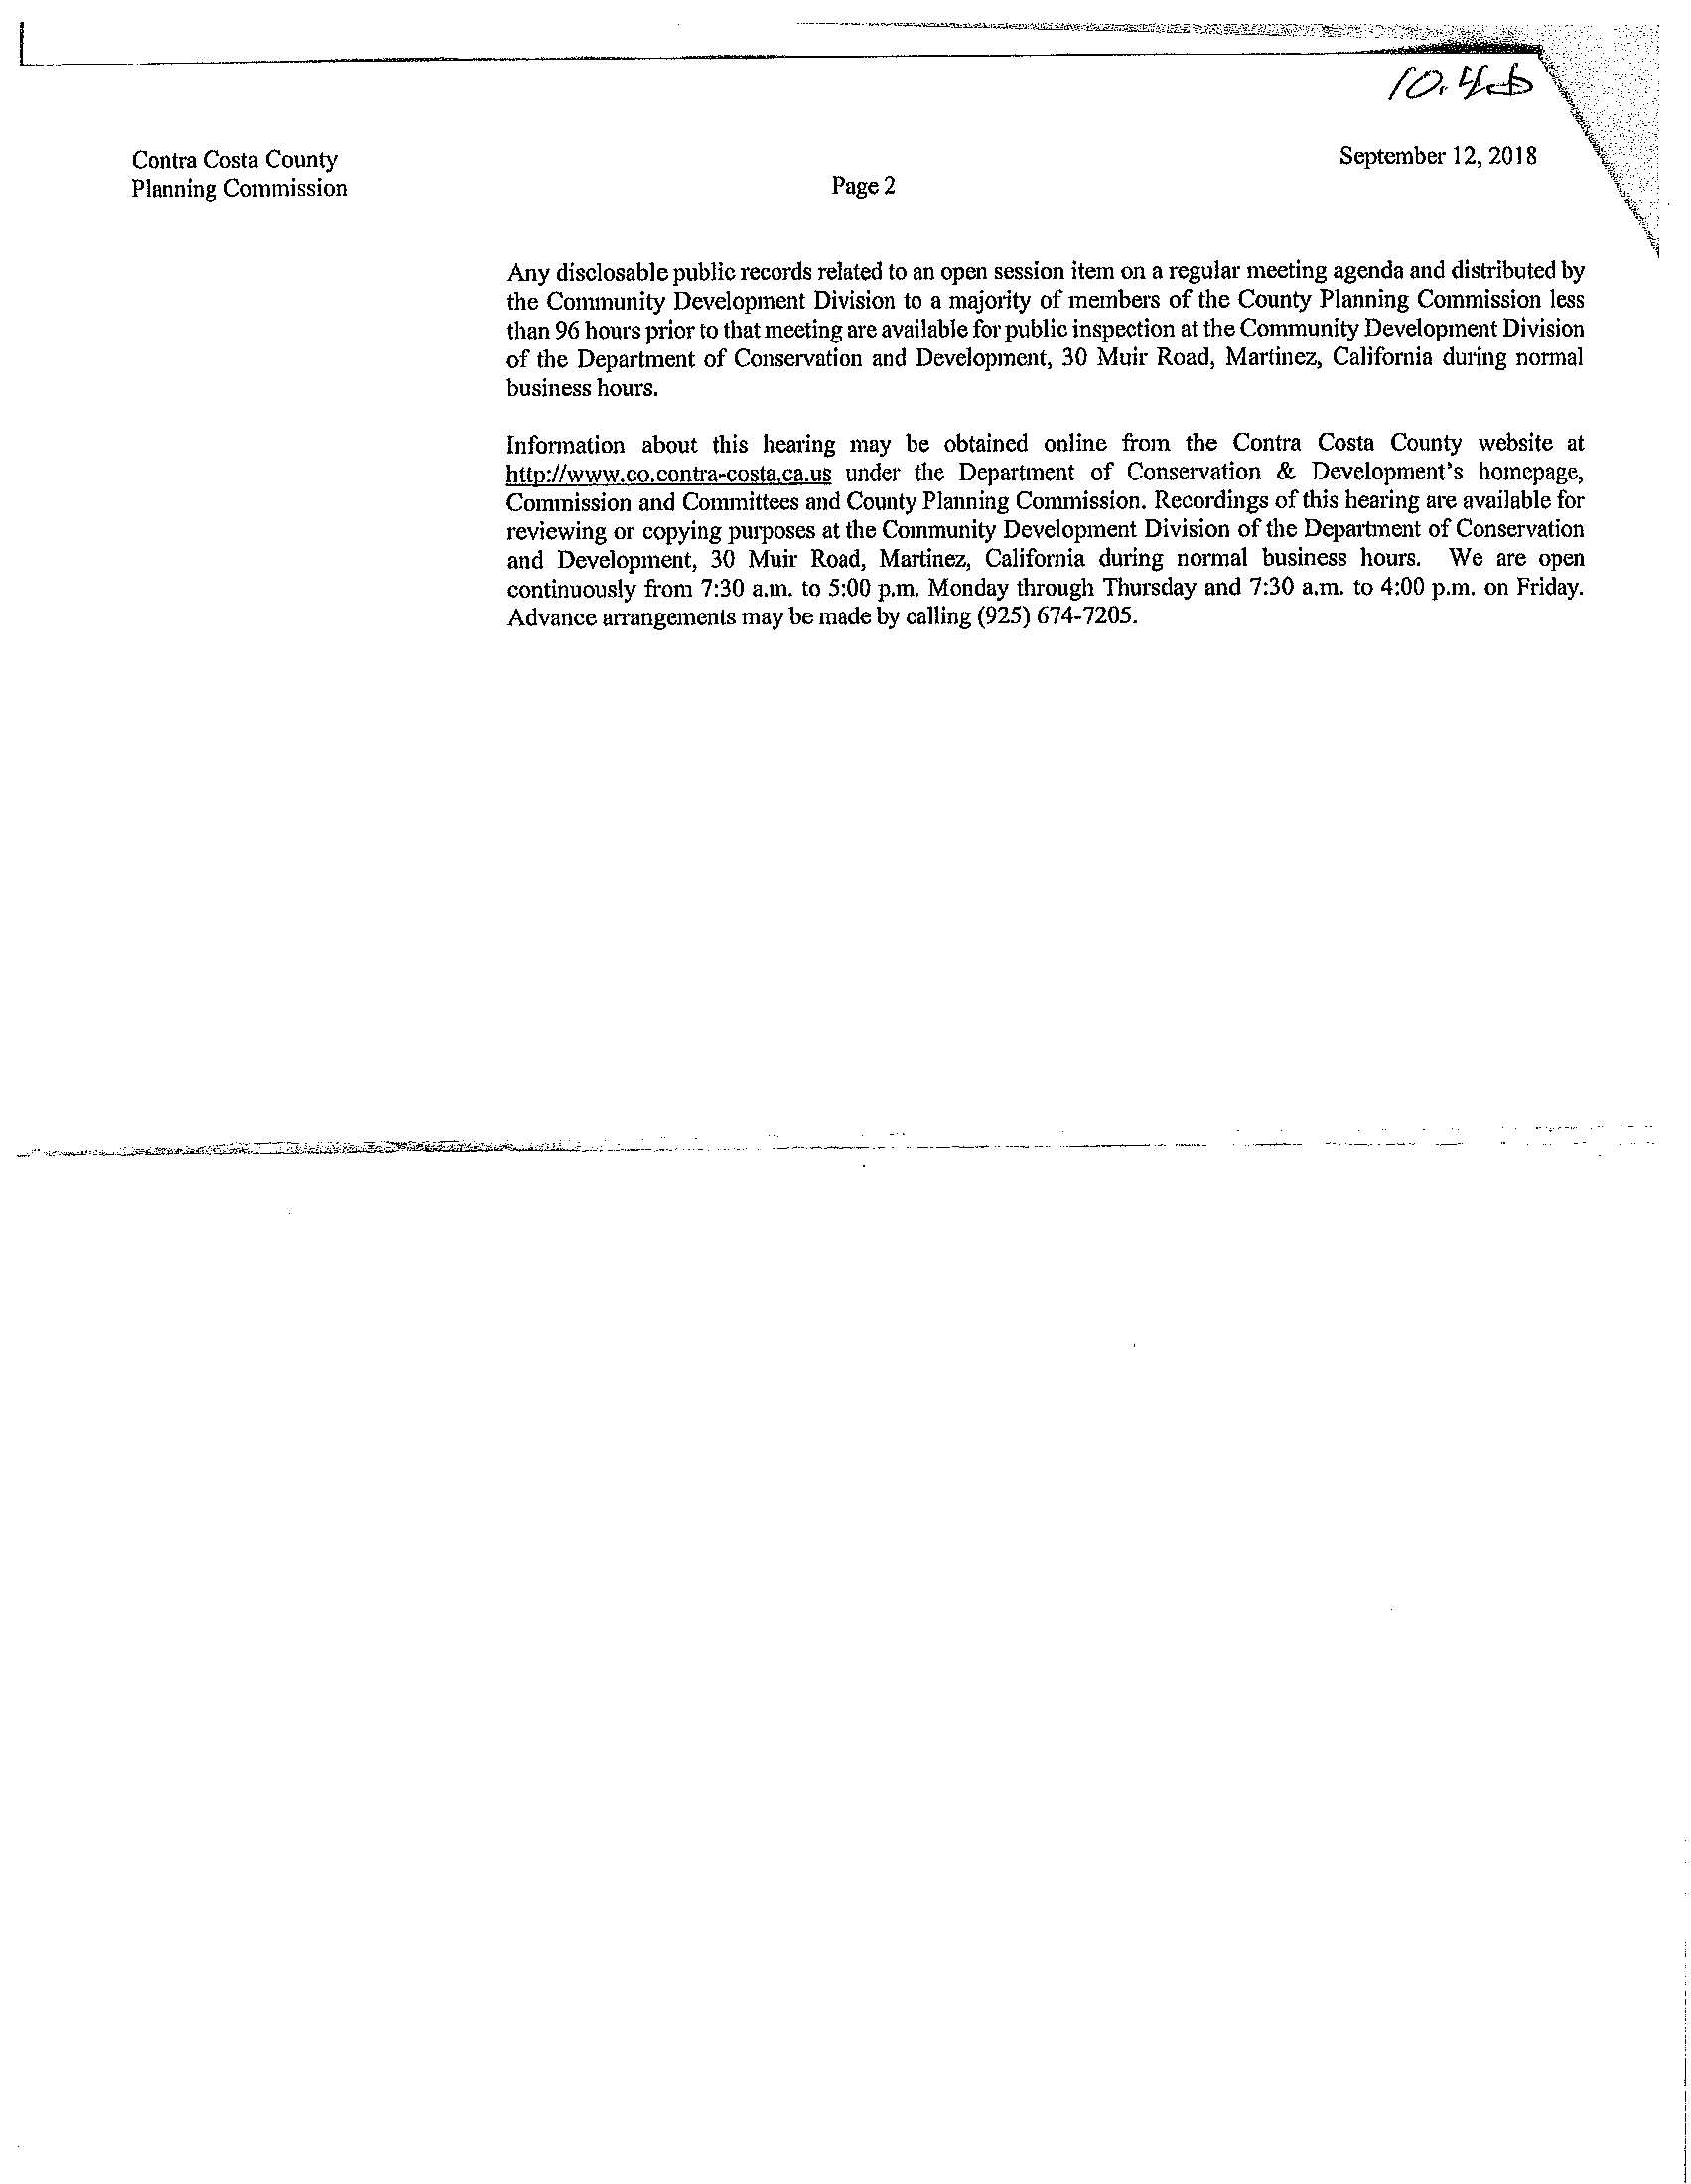 ESMAC Agenda 10.10.2018 (32 Pages)_24.jpg